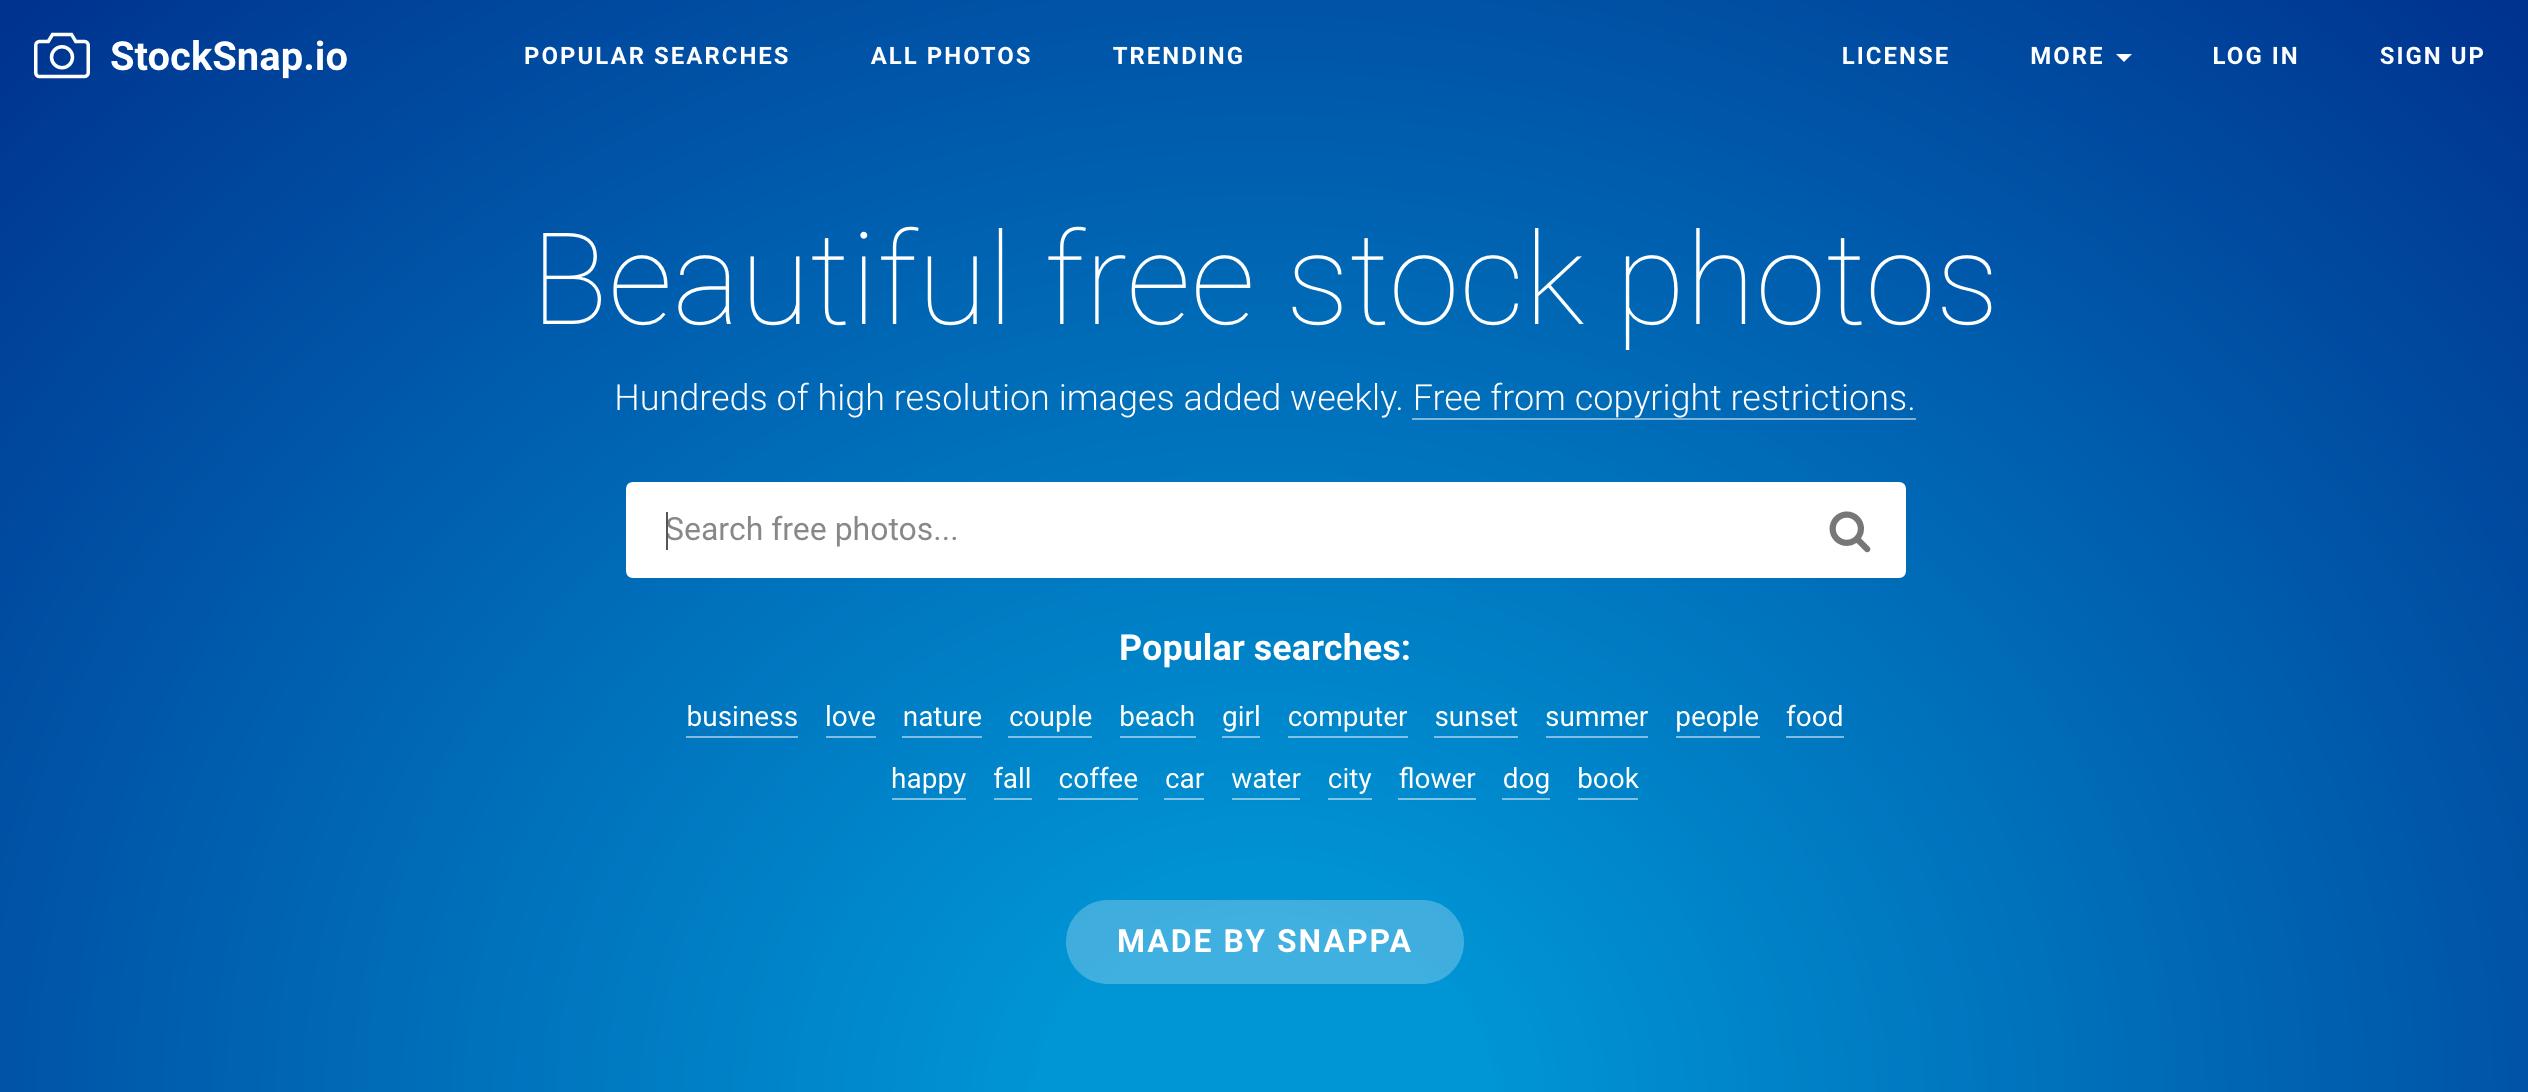 stocksnap.io free images